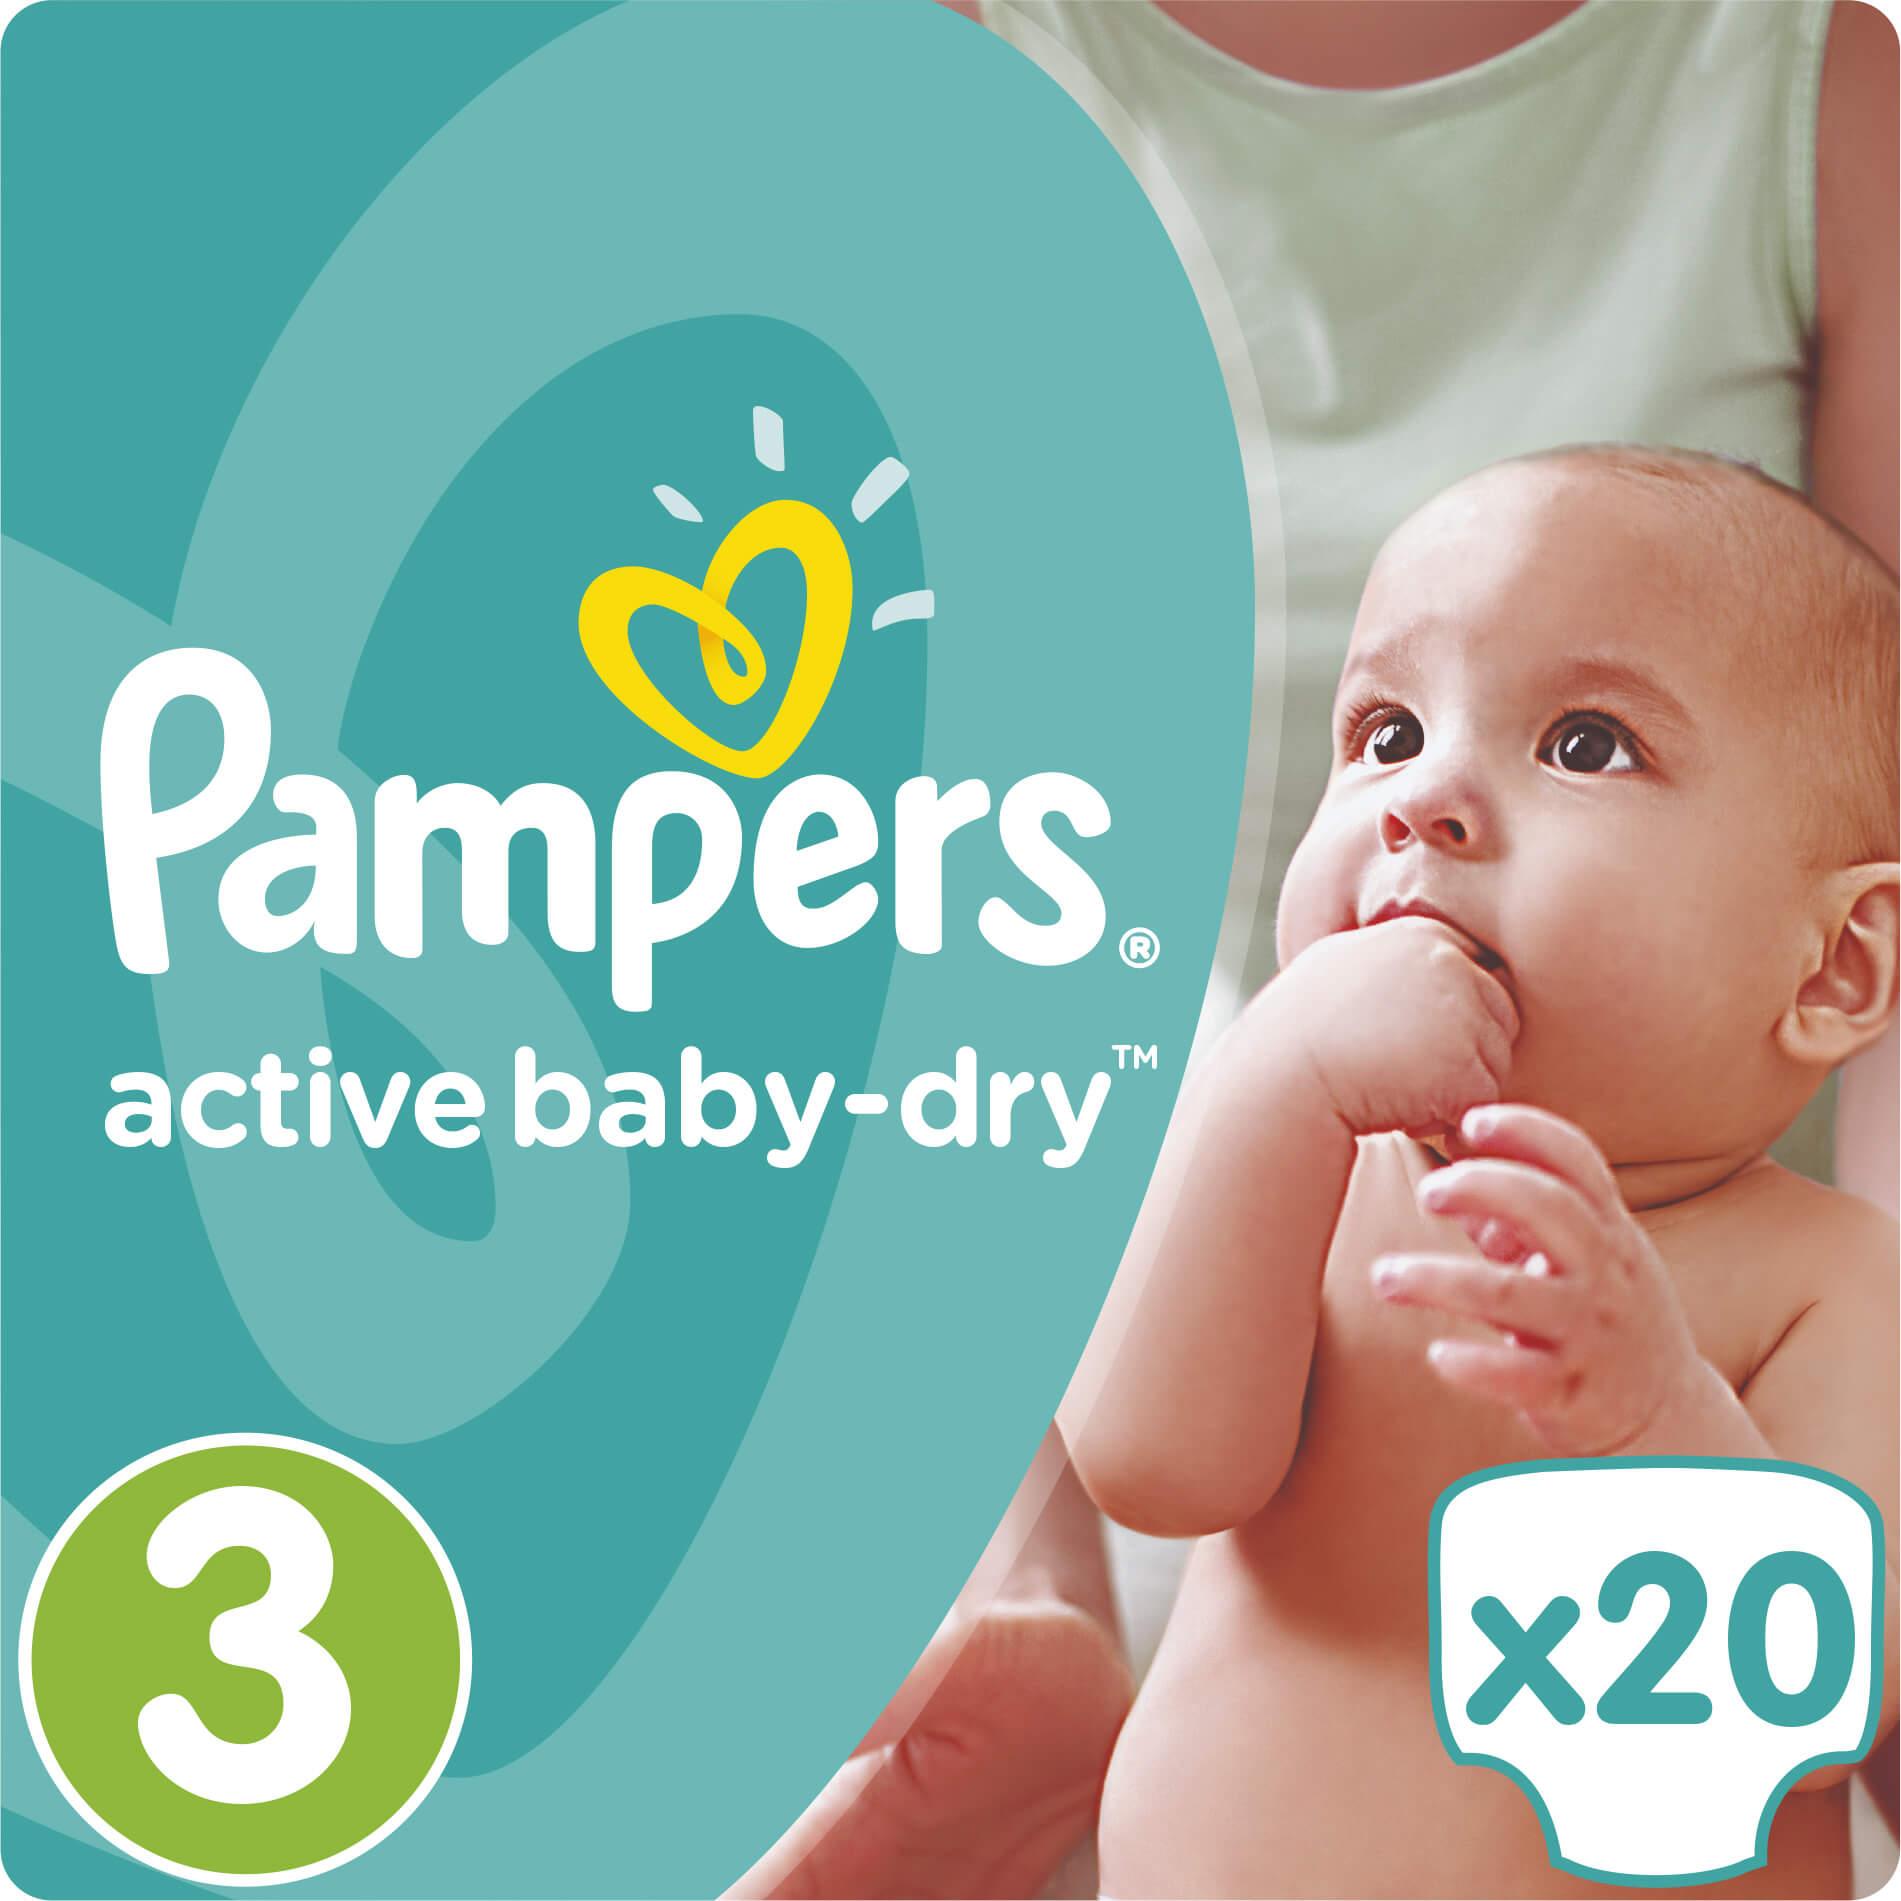 Pampers Active Baby Dry No3 (5-9kg) 20 πάνες μητέρα παιδί   περιποίηση για το μωρό   πάνες για το μωρό